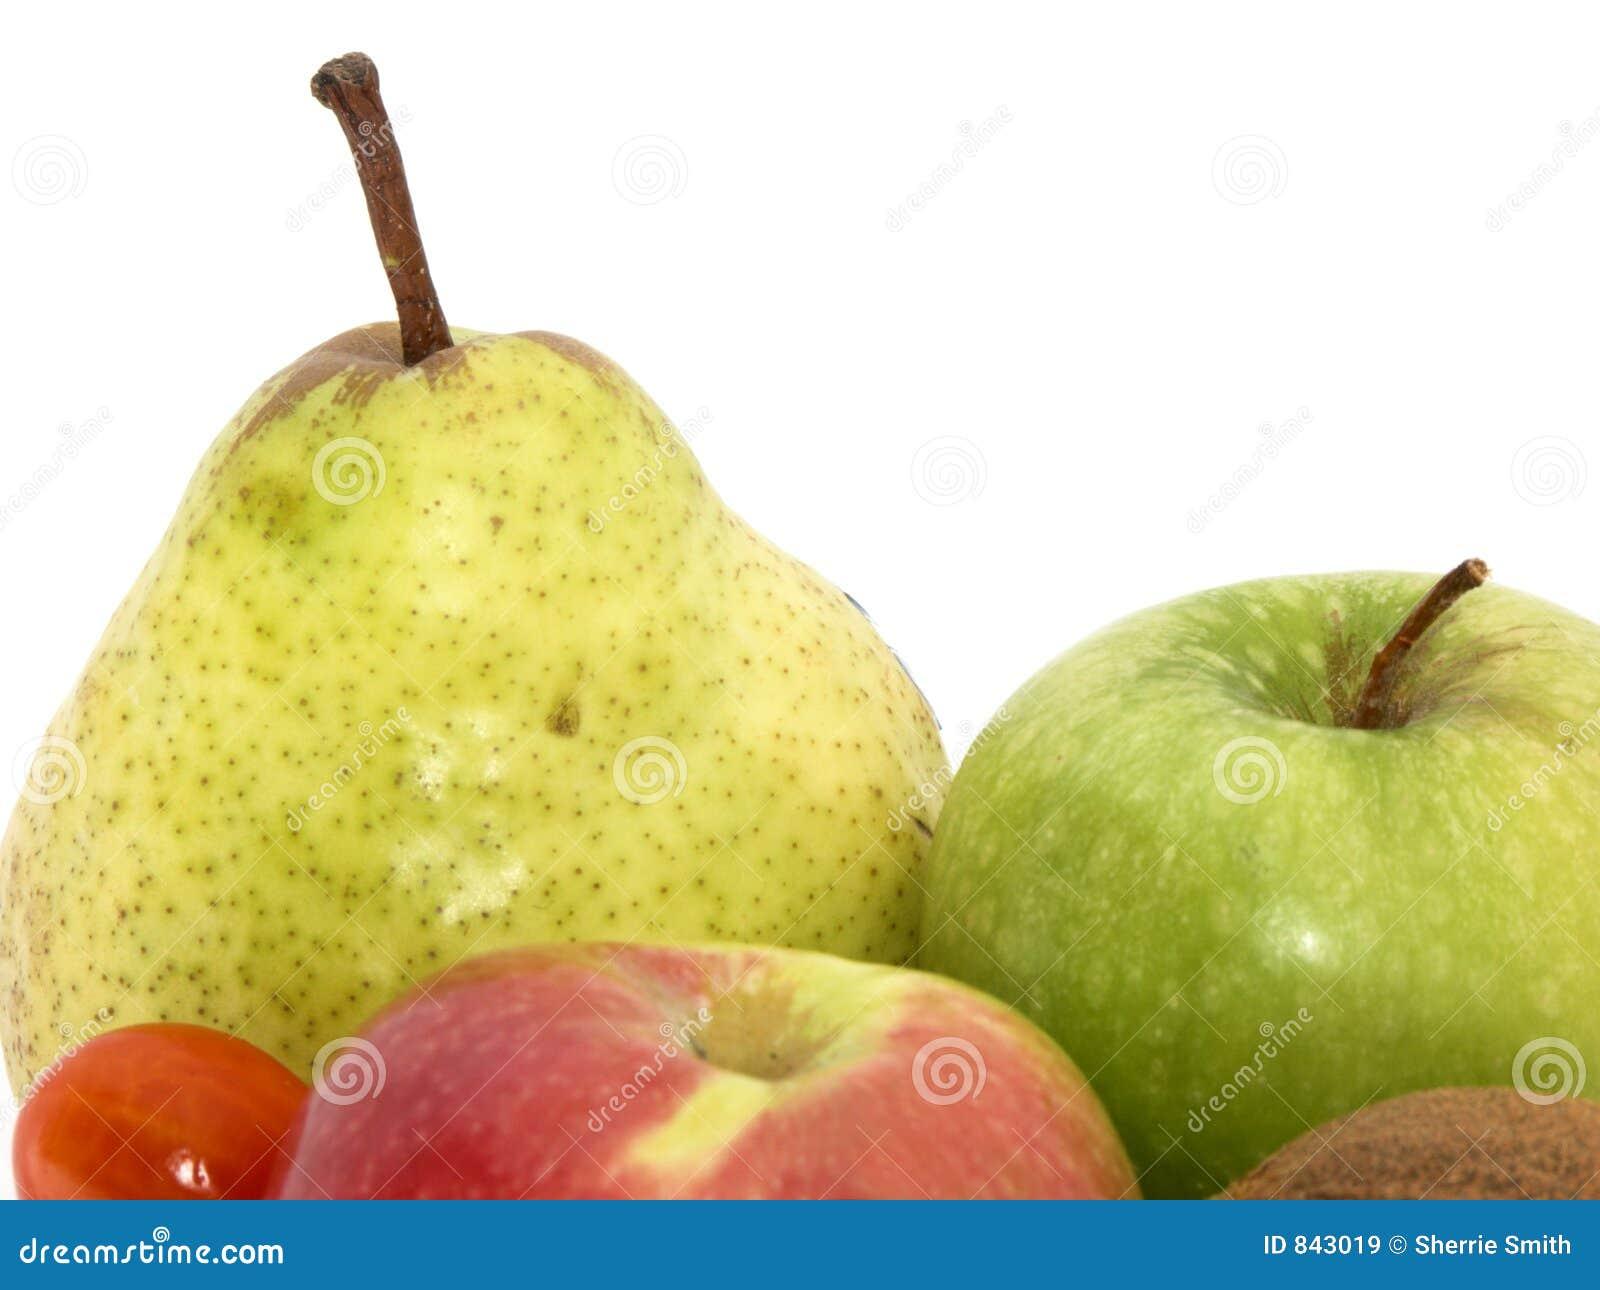 Fruit and veg #3